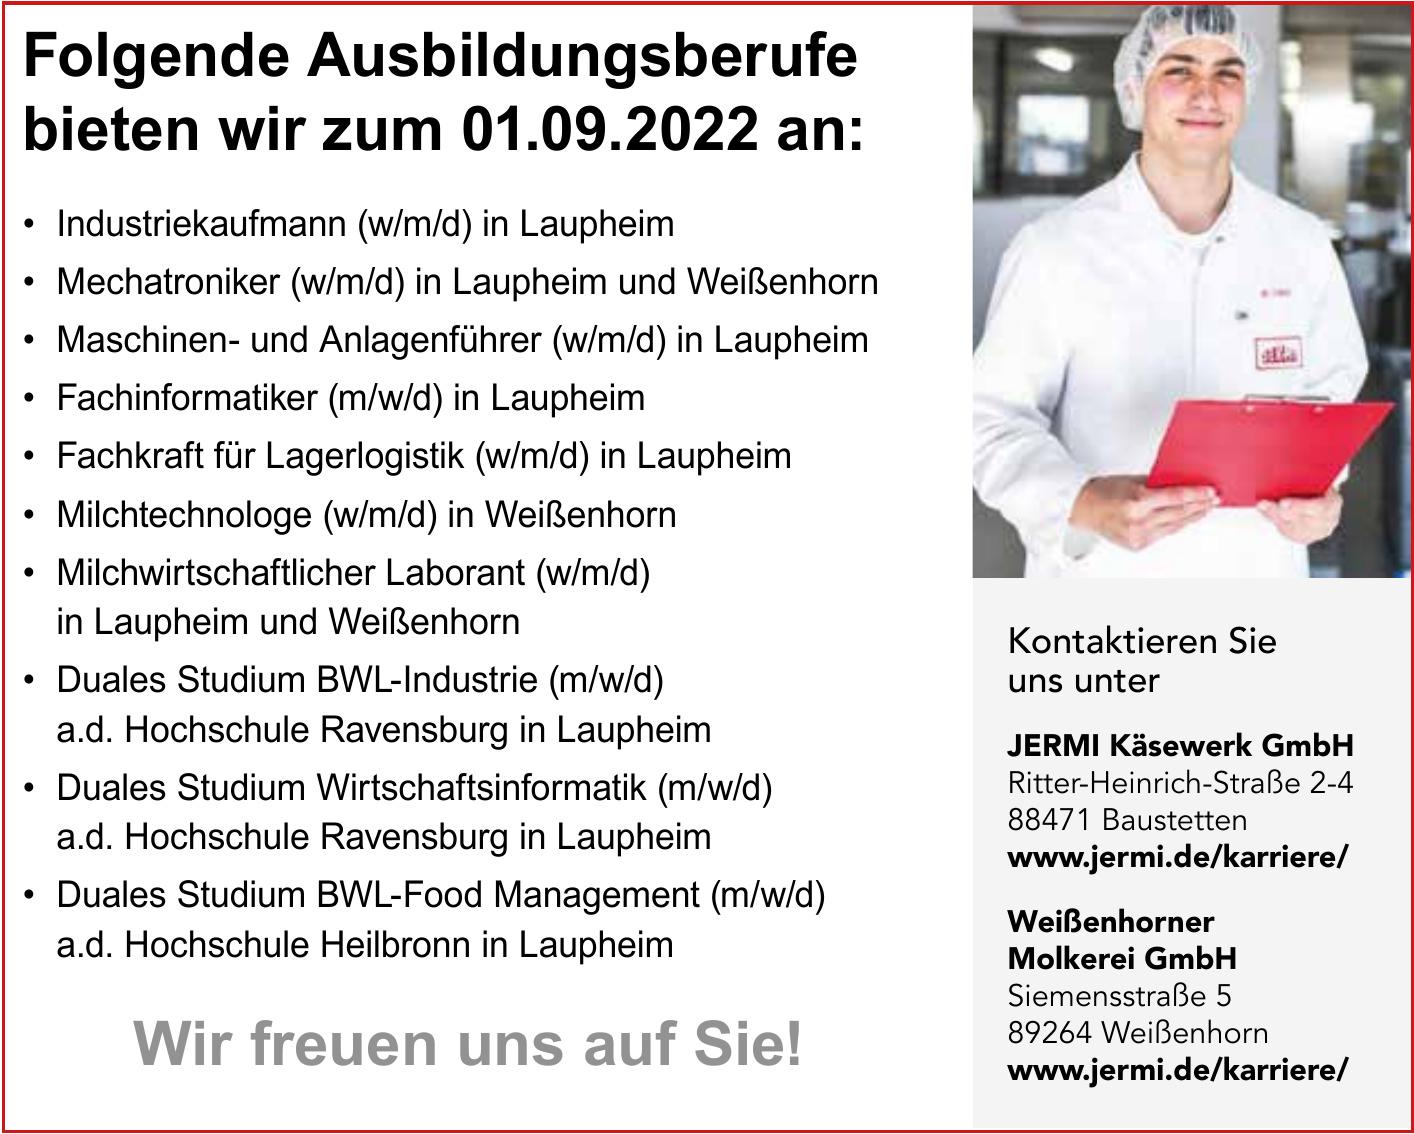 Jermi Käsewerk GmbH